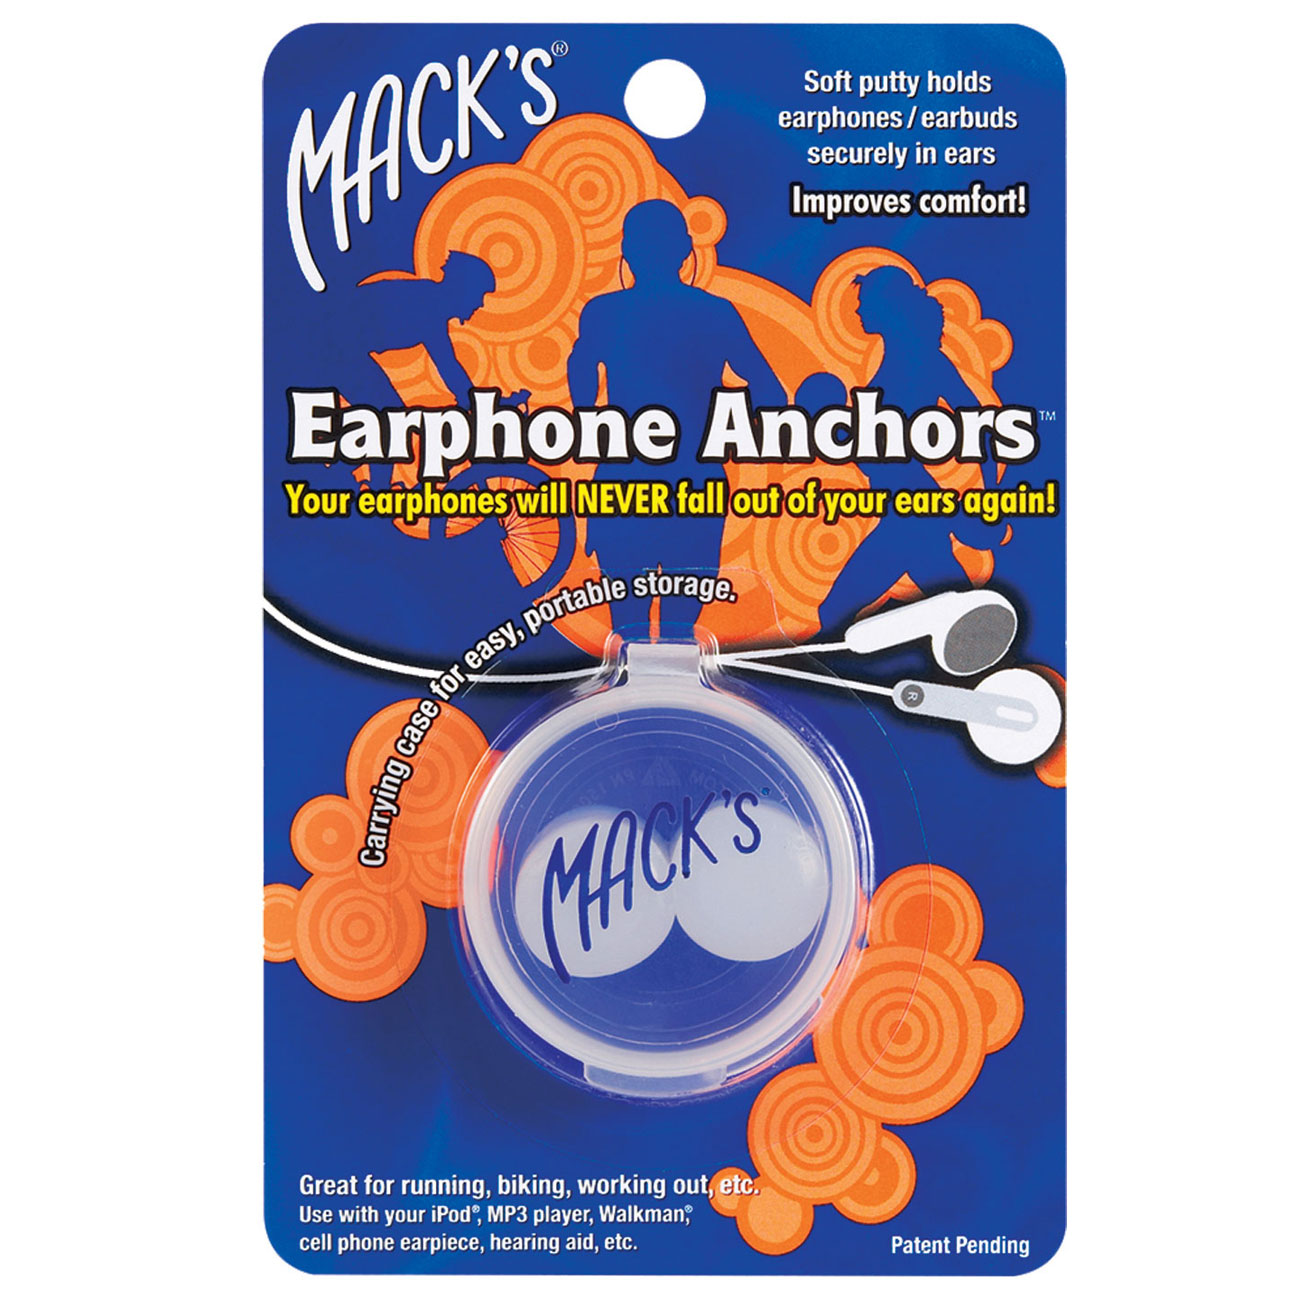 Hearing Care Aid Protectors And Maintenance Dry Ems Adjustable Headband Lemon Floral For Baby Earmuff Macks Earphone Anchors